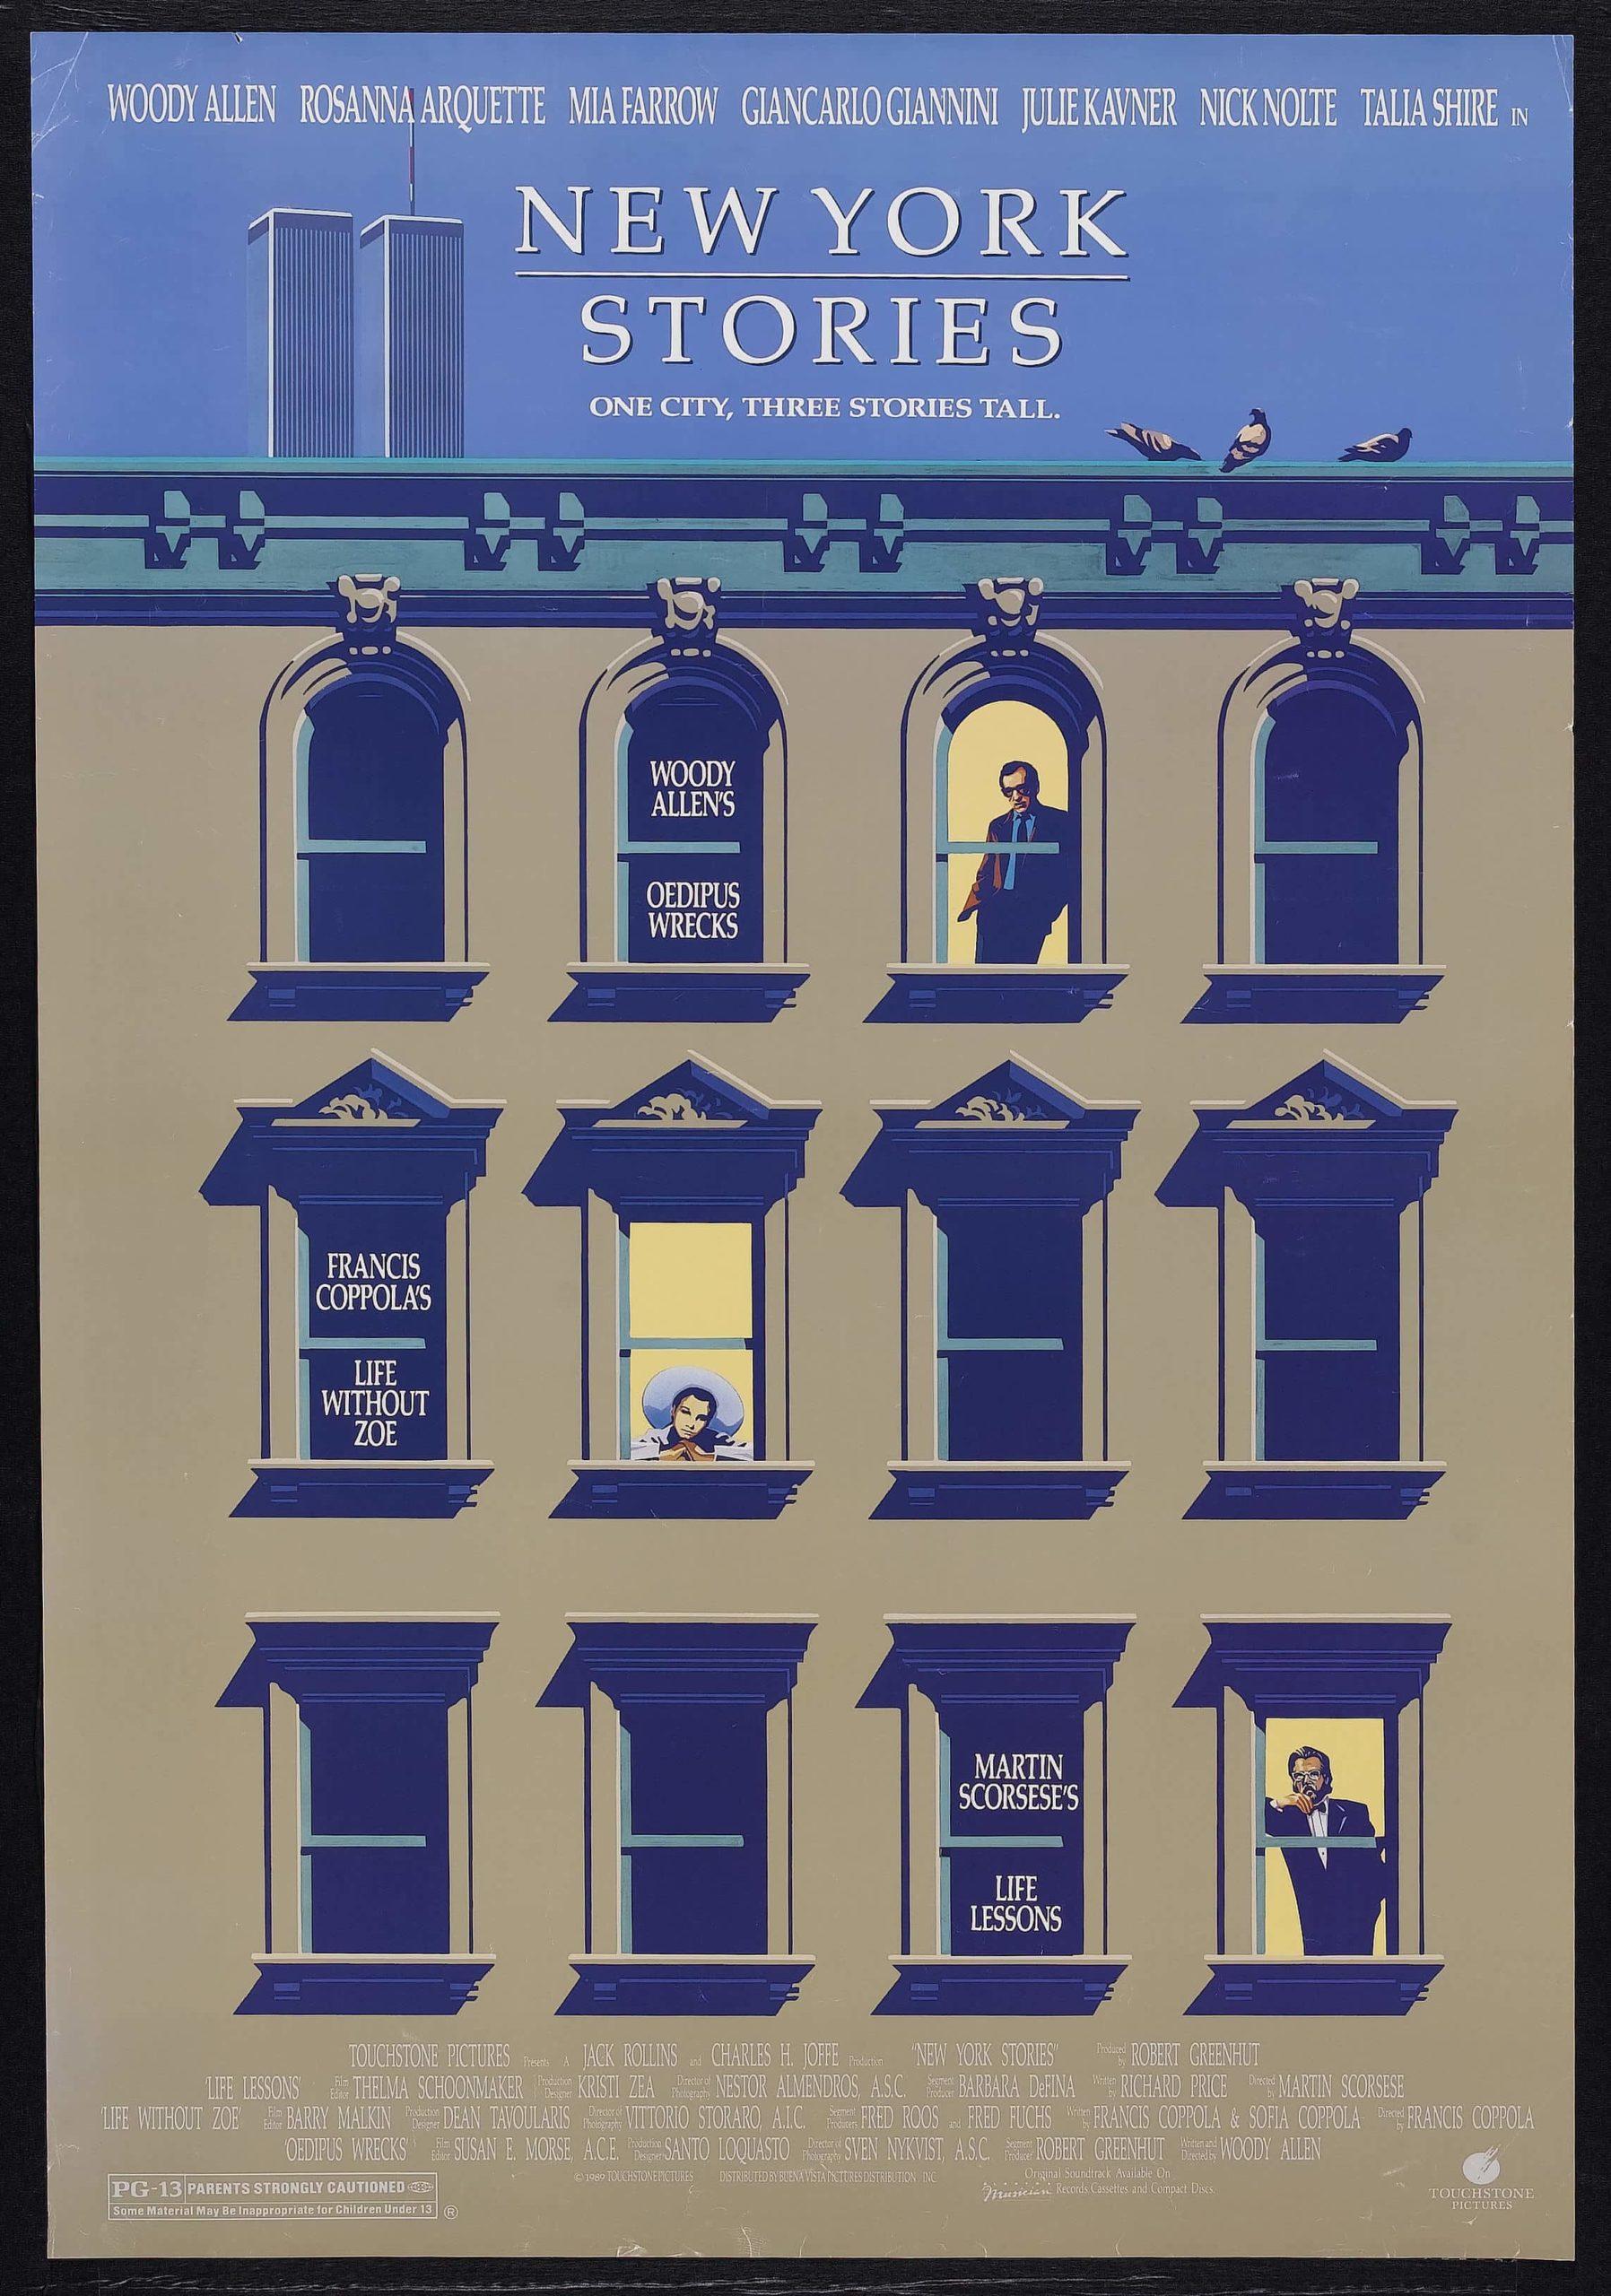 1989 New York stories - Historias de Nueva York (ing) 01